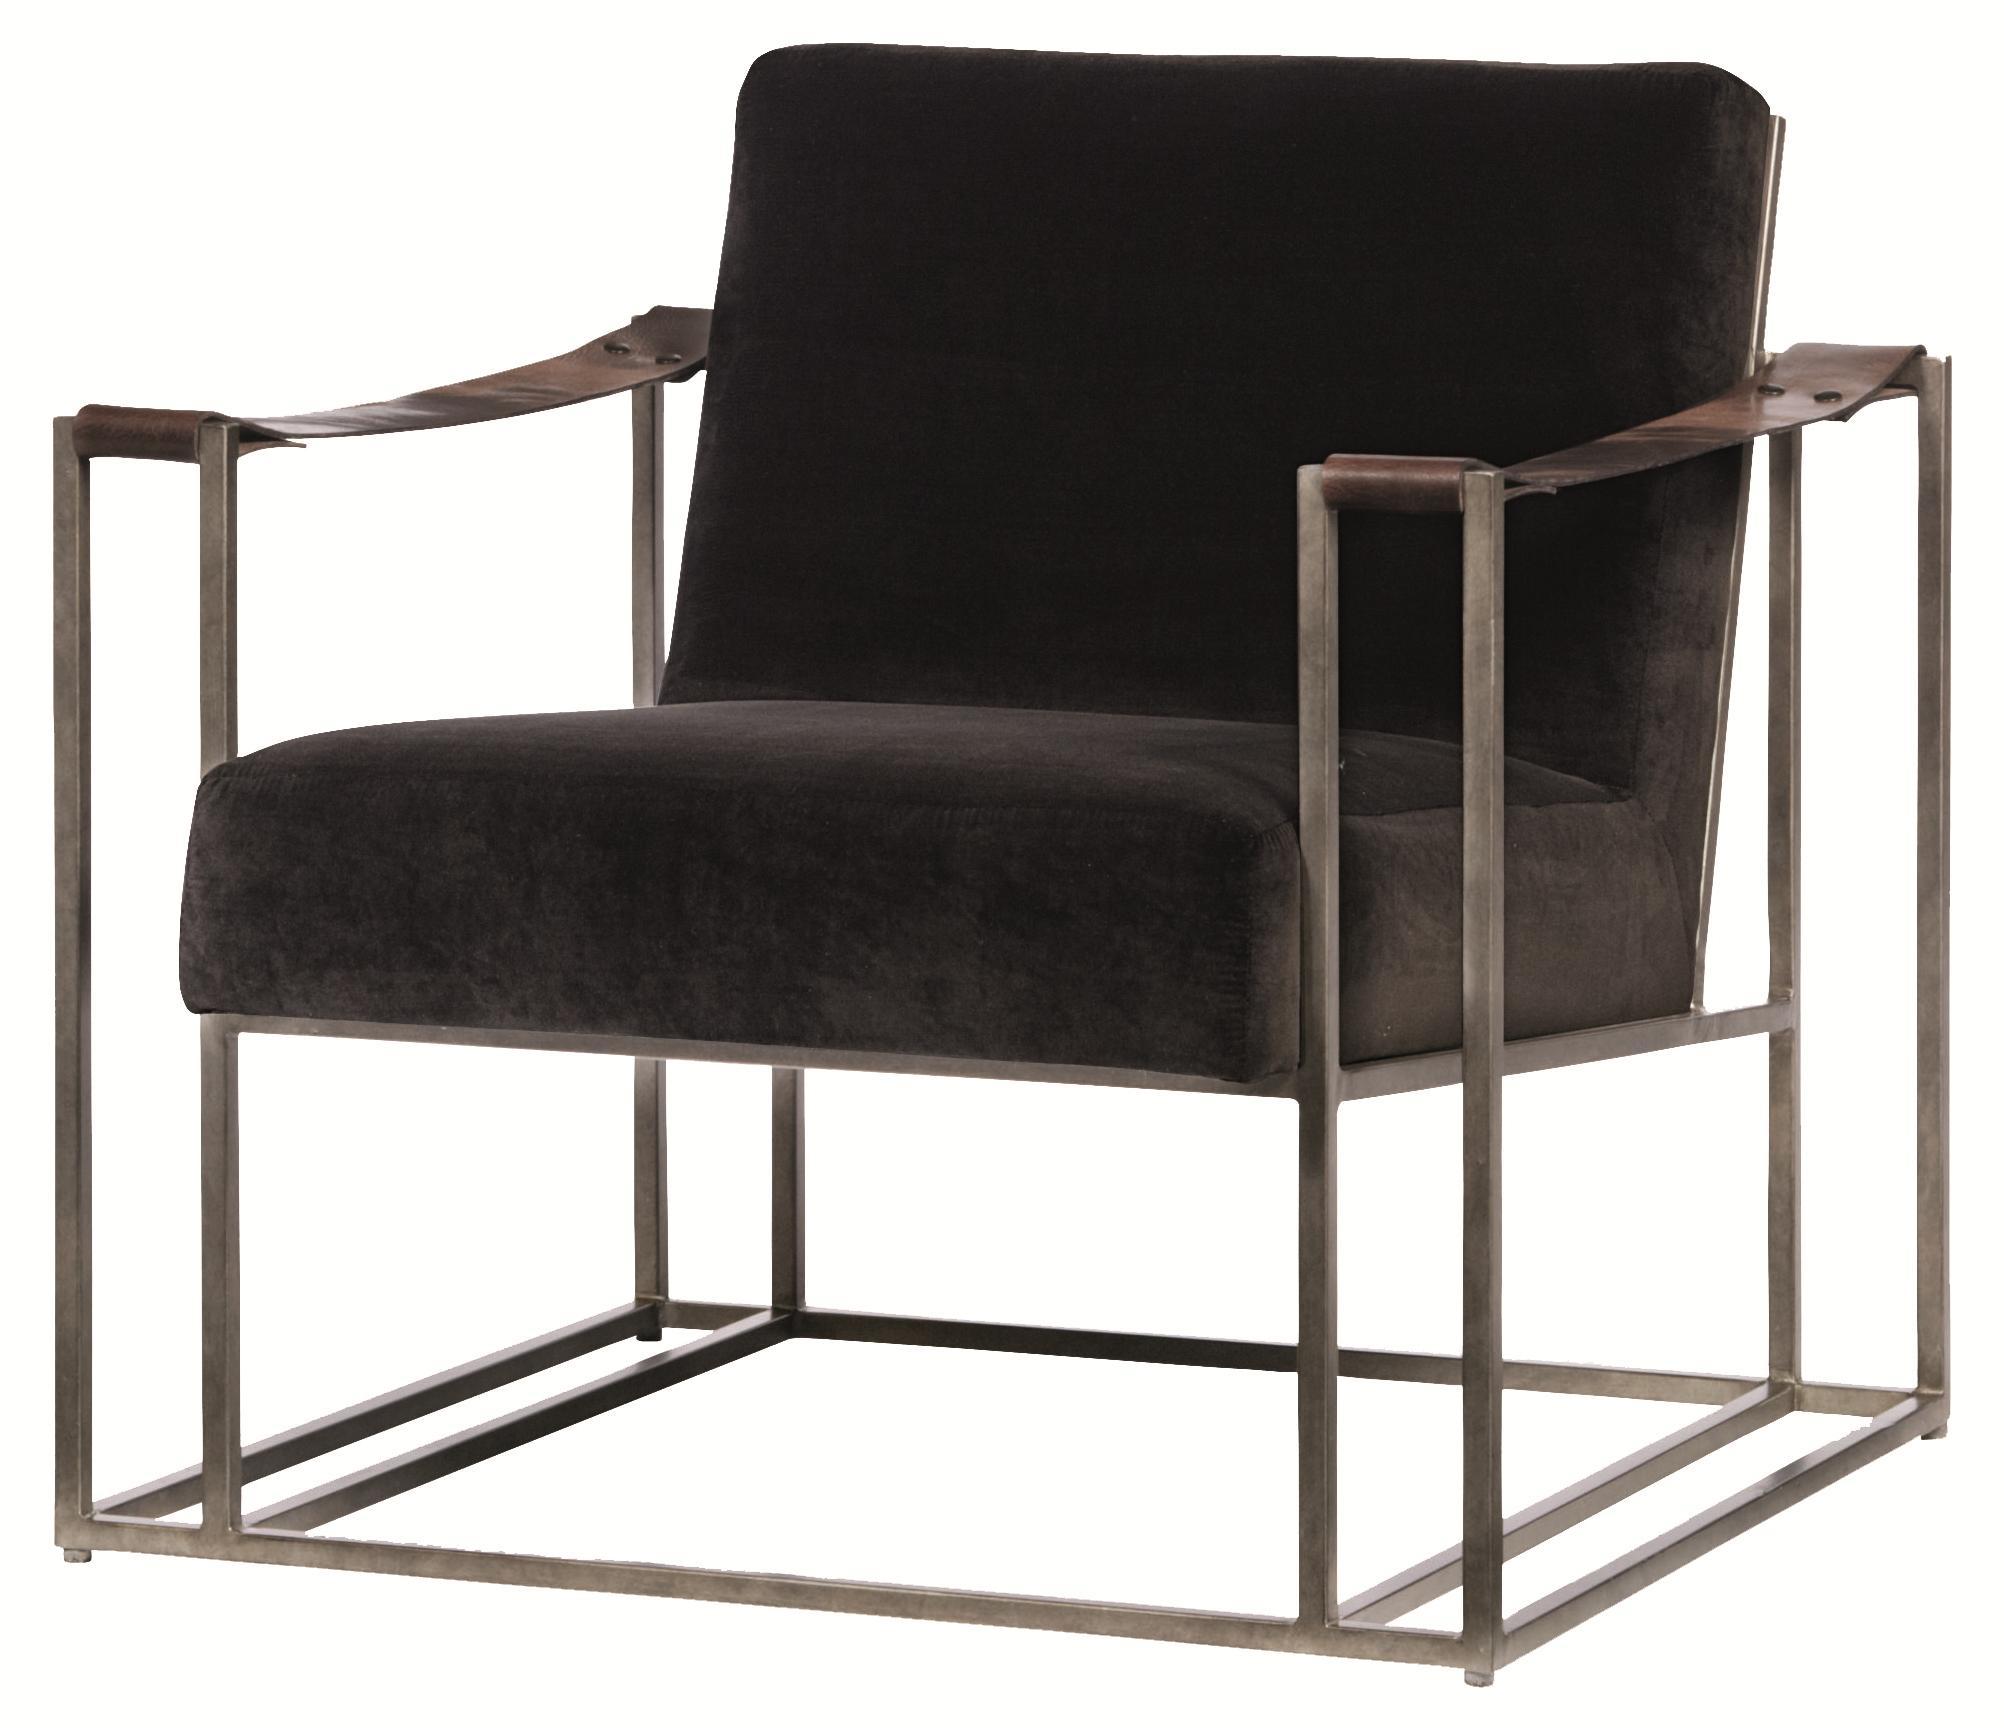 Bernhardt Dekker B3212 High End Accent Chair With Modern Style Dunk Bright Furniture